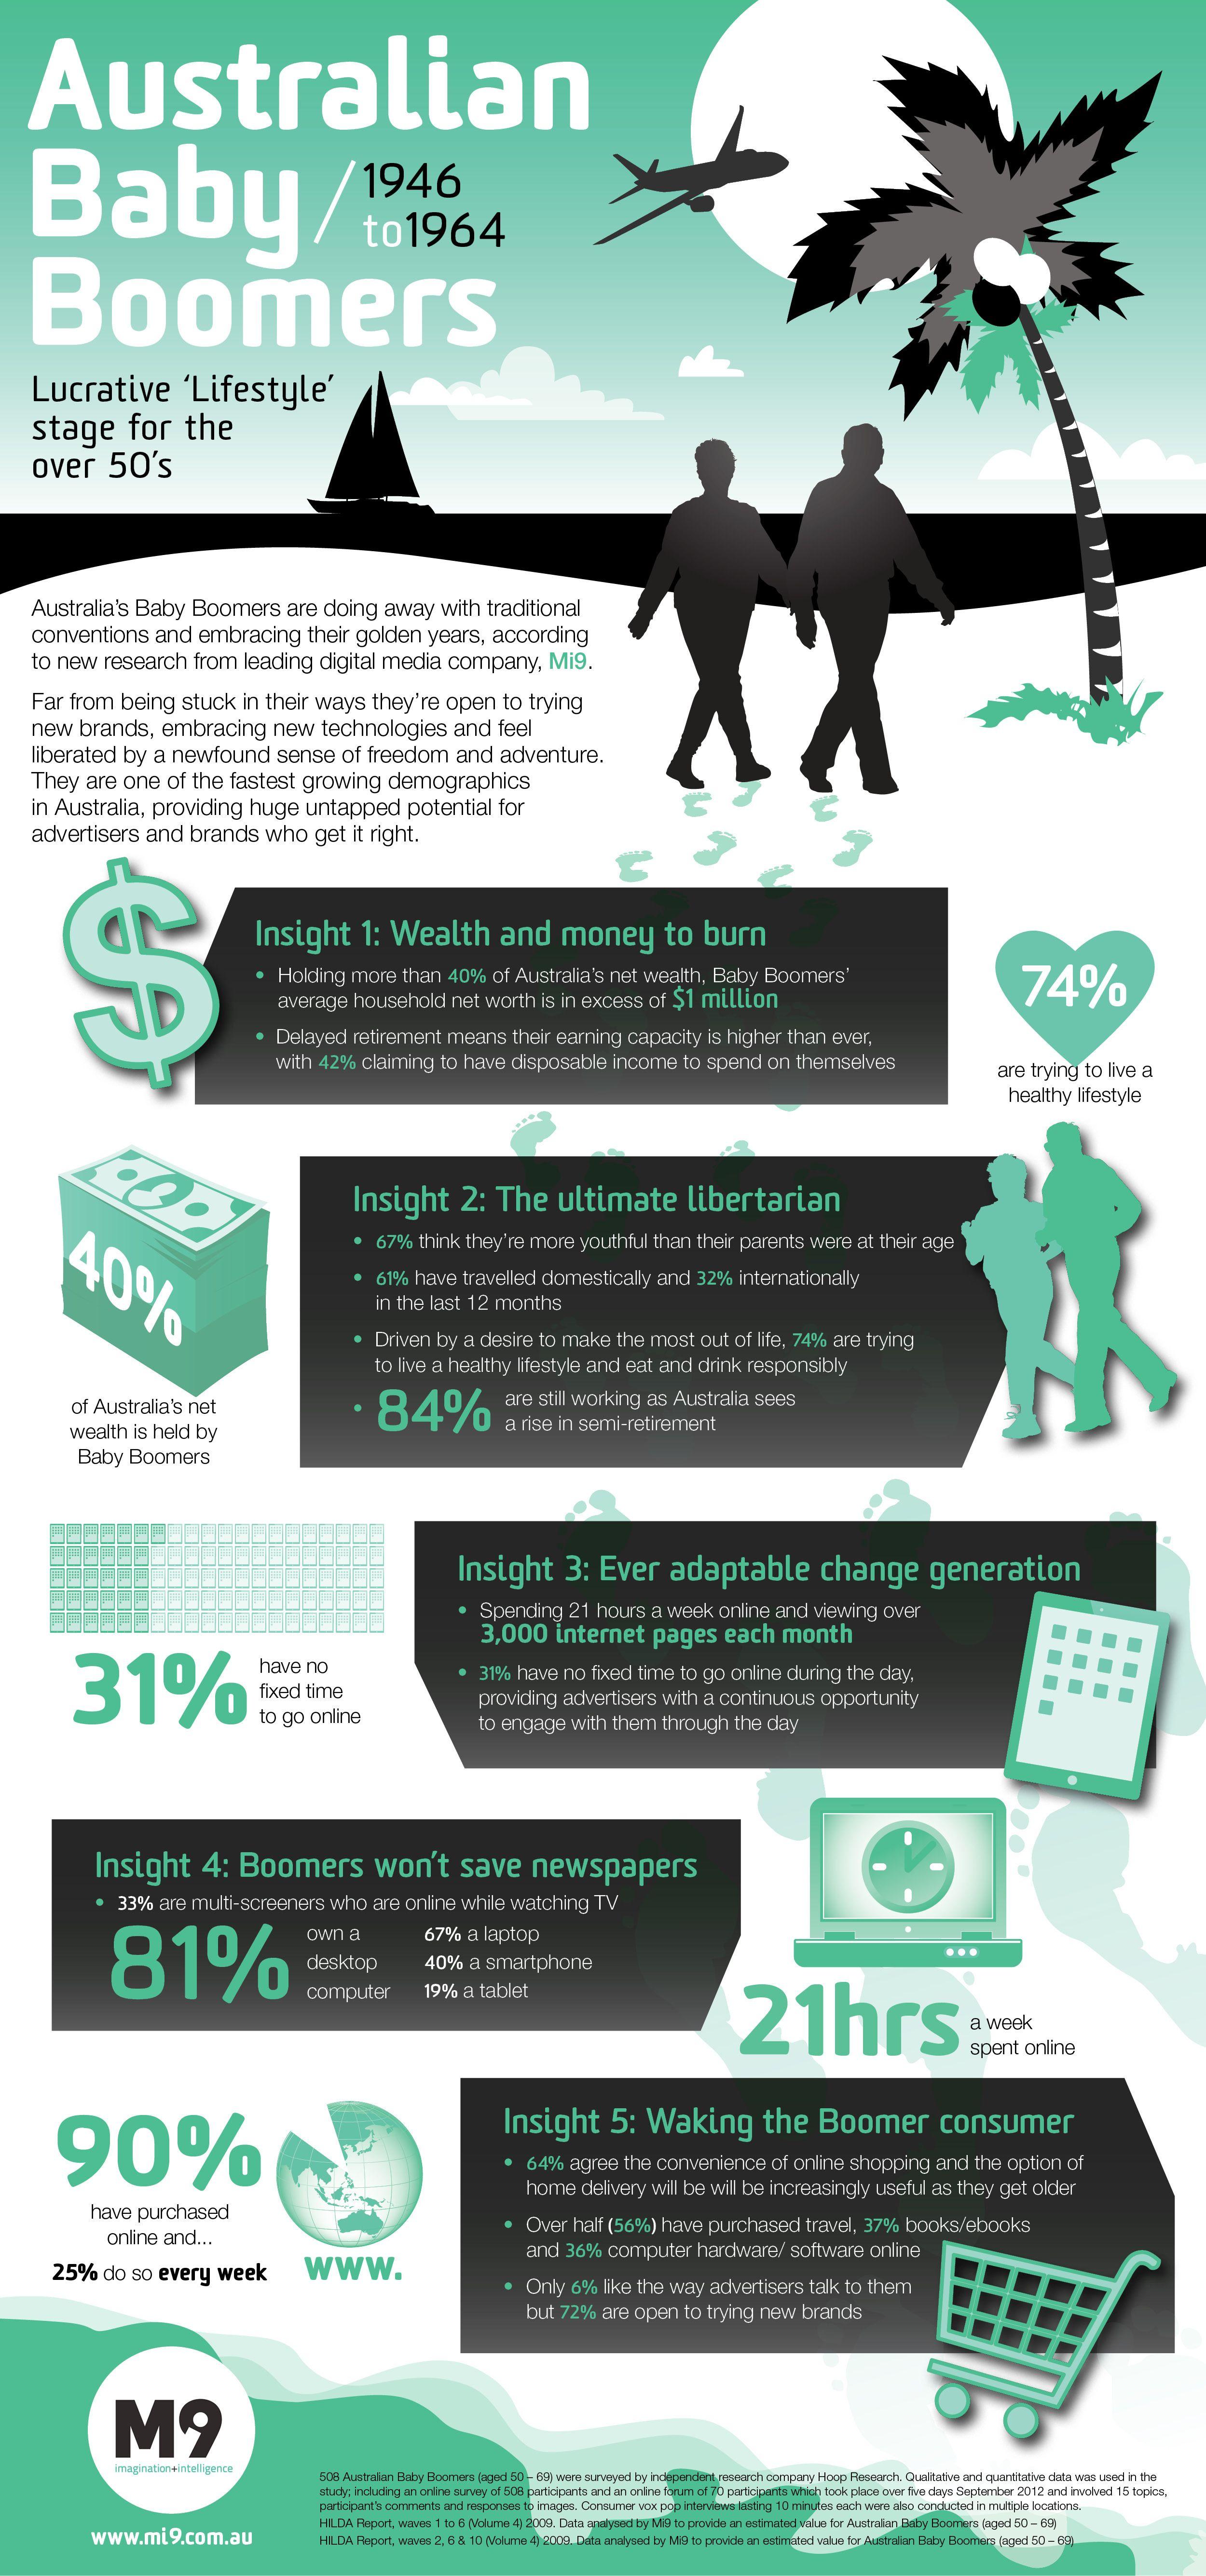 Australian baby boomers Characteristics | Baby boomers ...